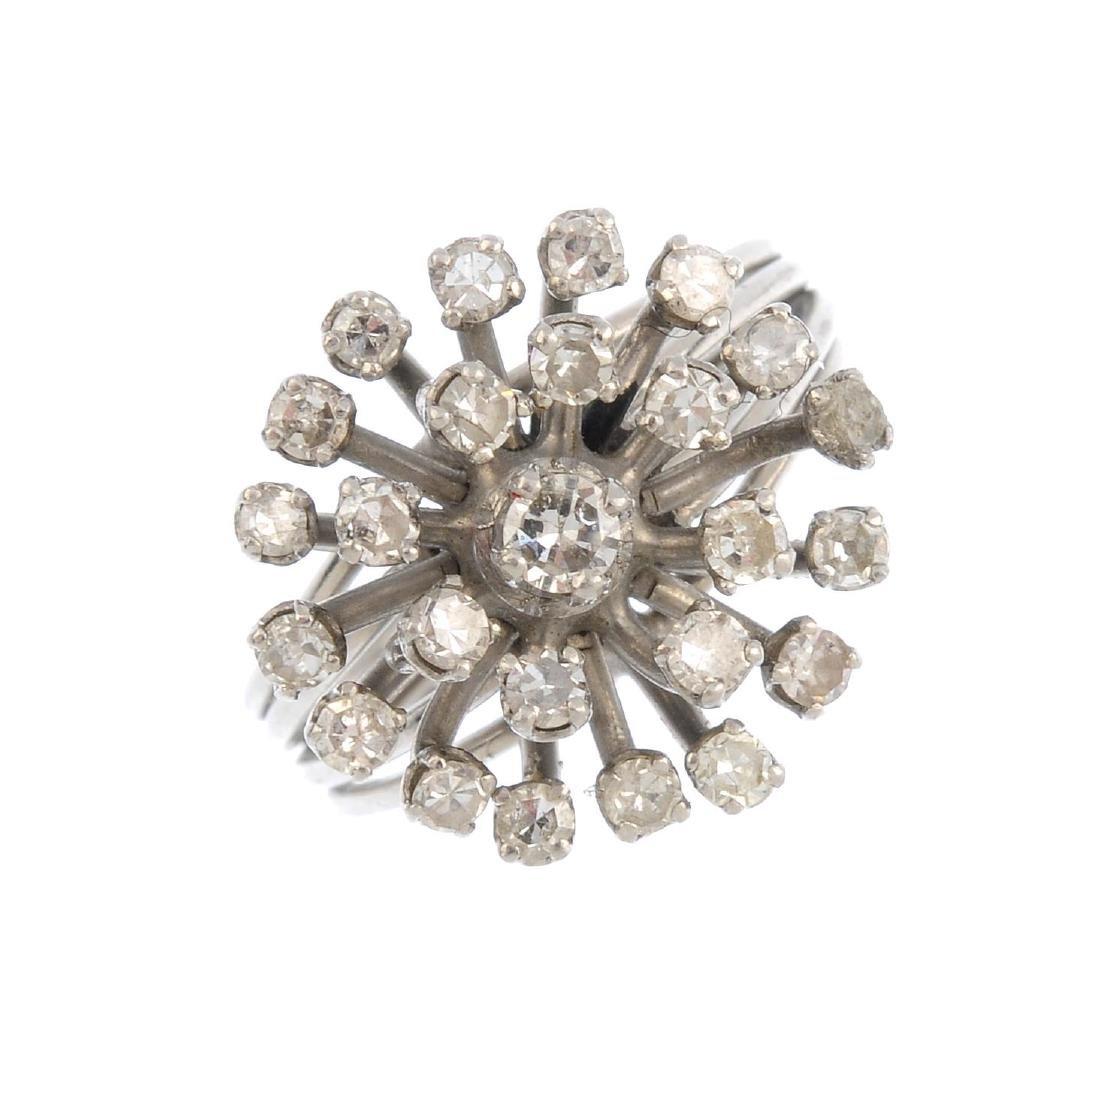 A diamond cluster ring. The single-cut diamond openwork